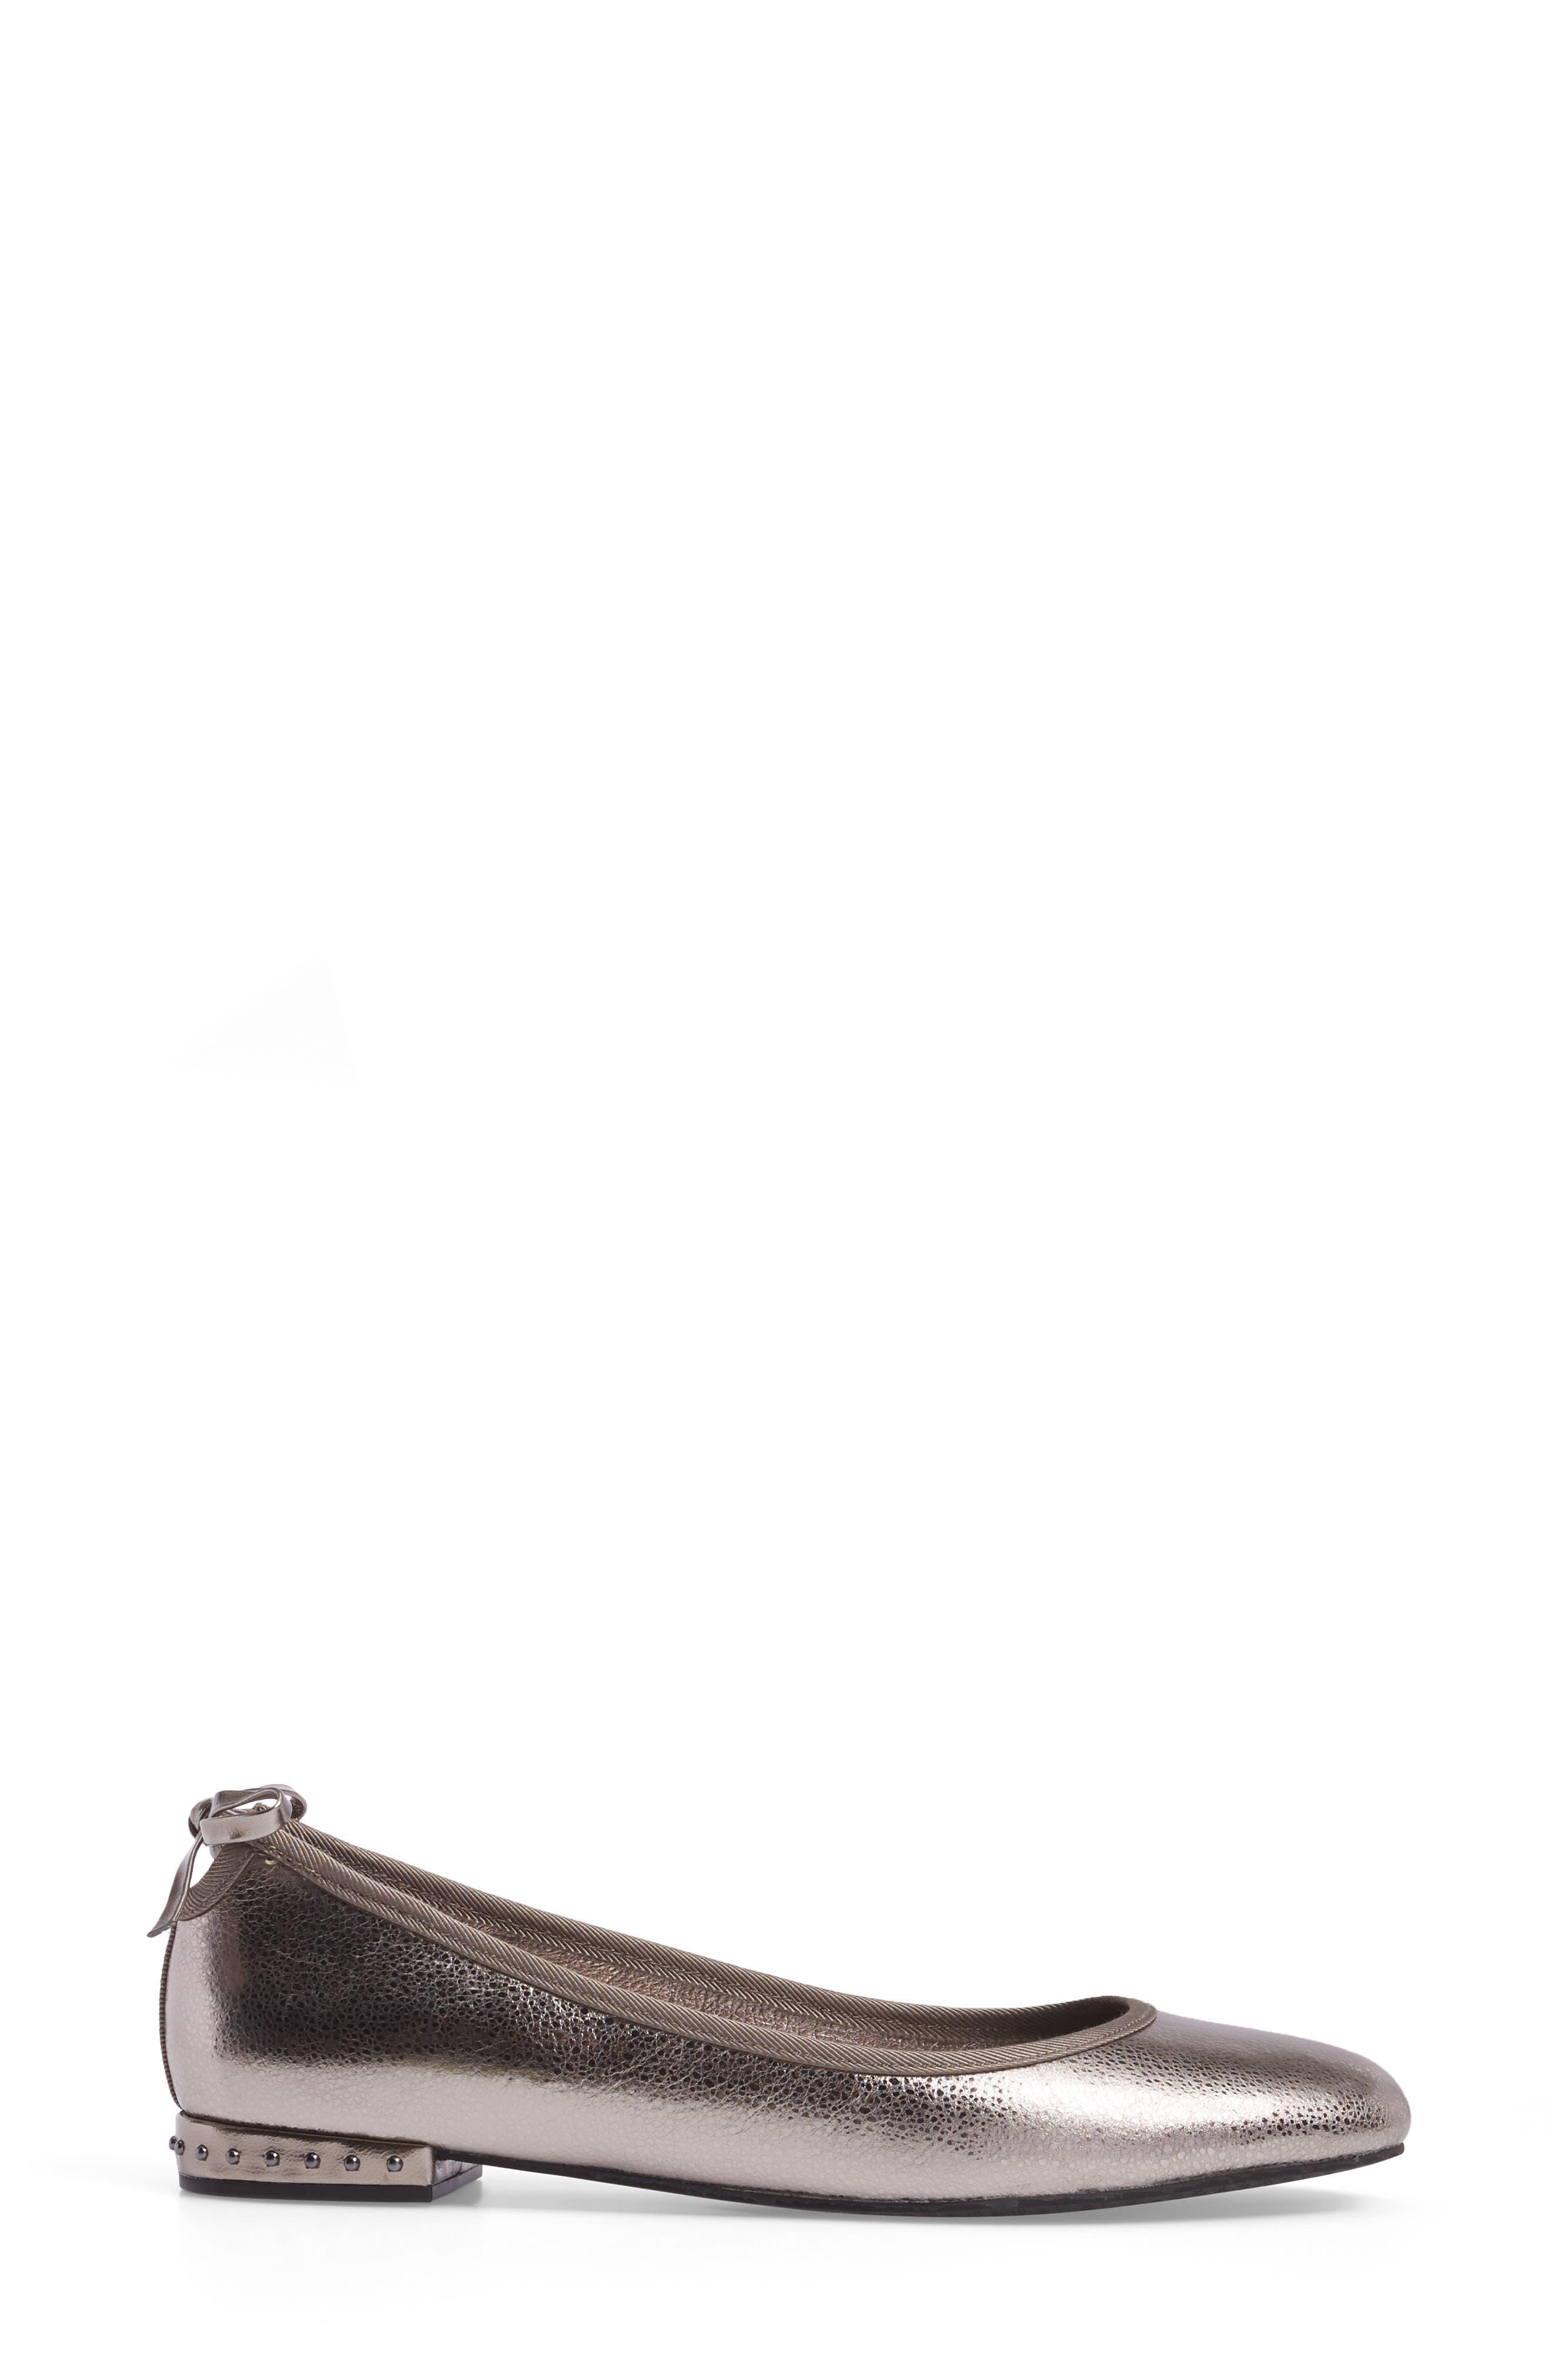 Brianne Flat,                             Alternate thumbnail 3, color,                             Gunmetal Leather